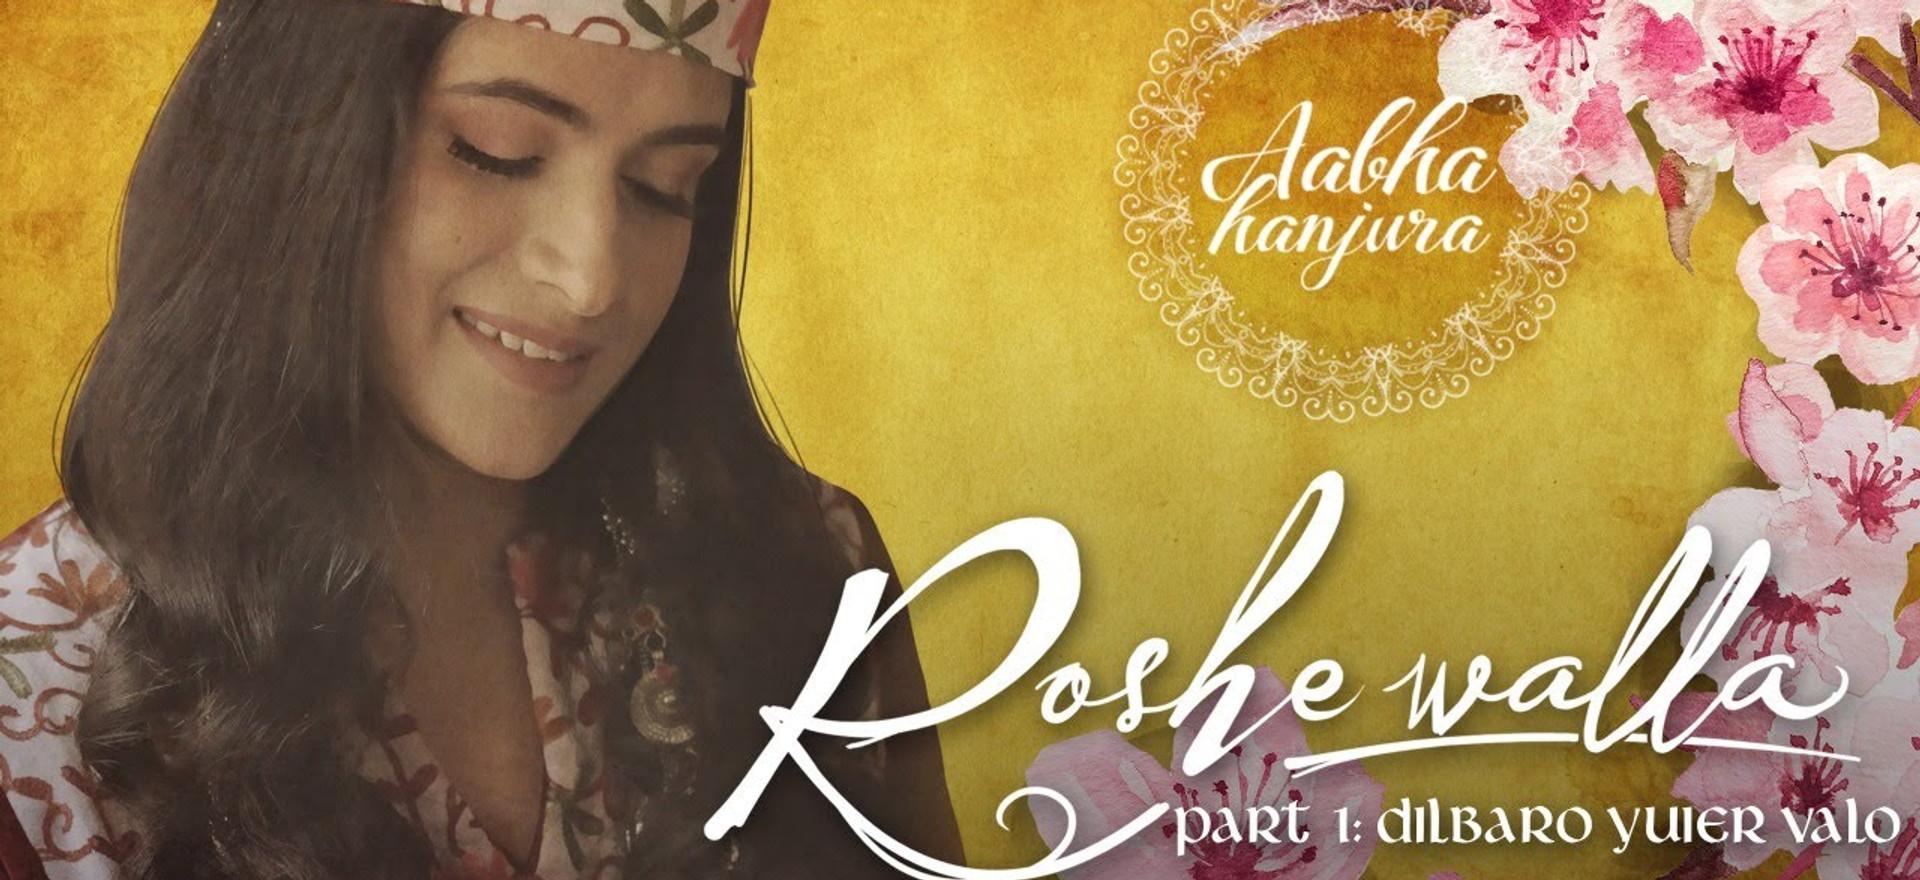 Dilbaro Yuier Valo | Roshewalla Part 1 | Aabha Hanjura